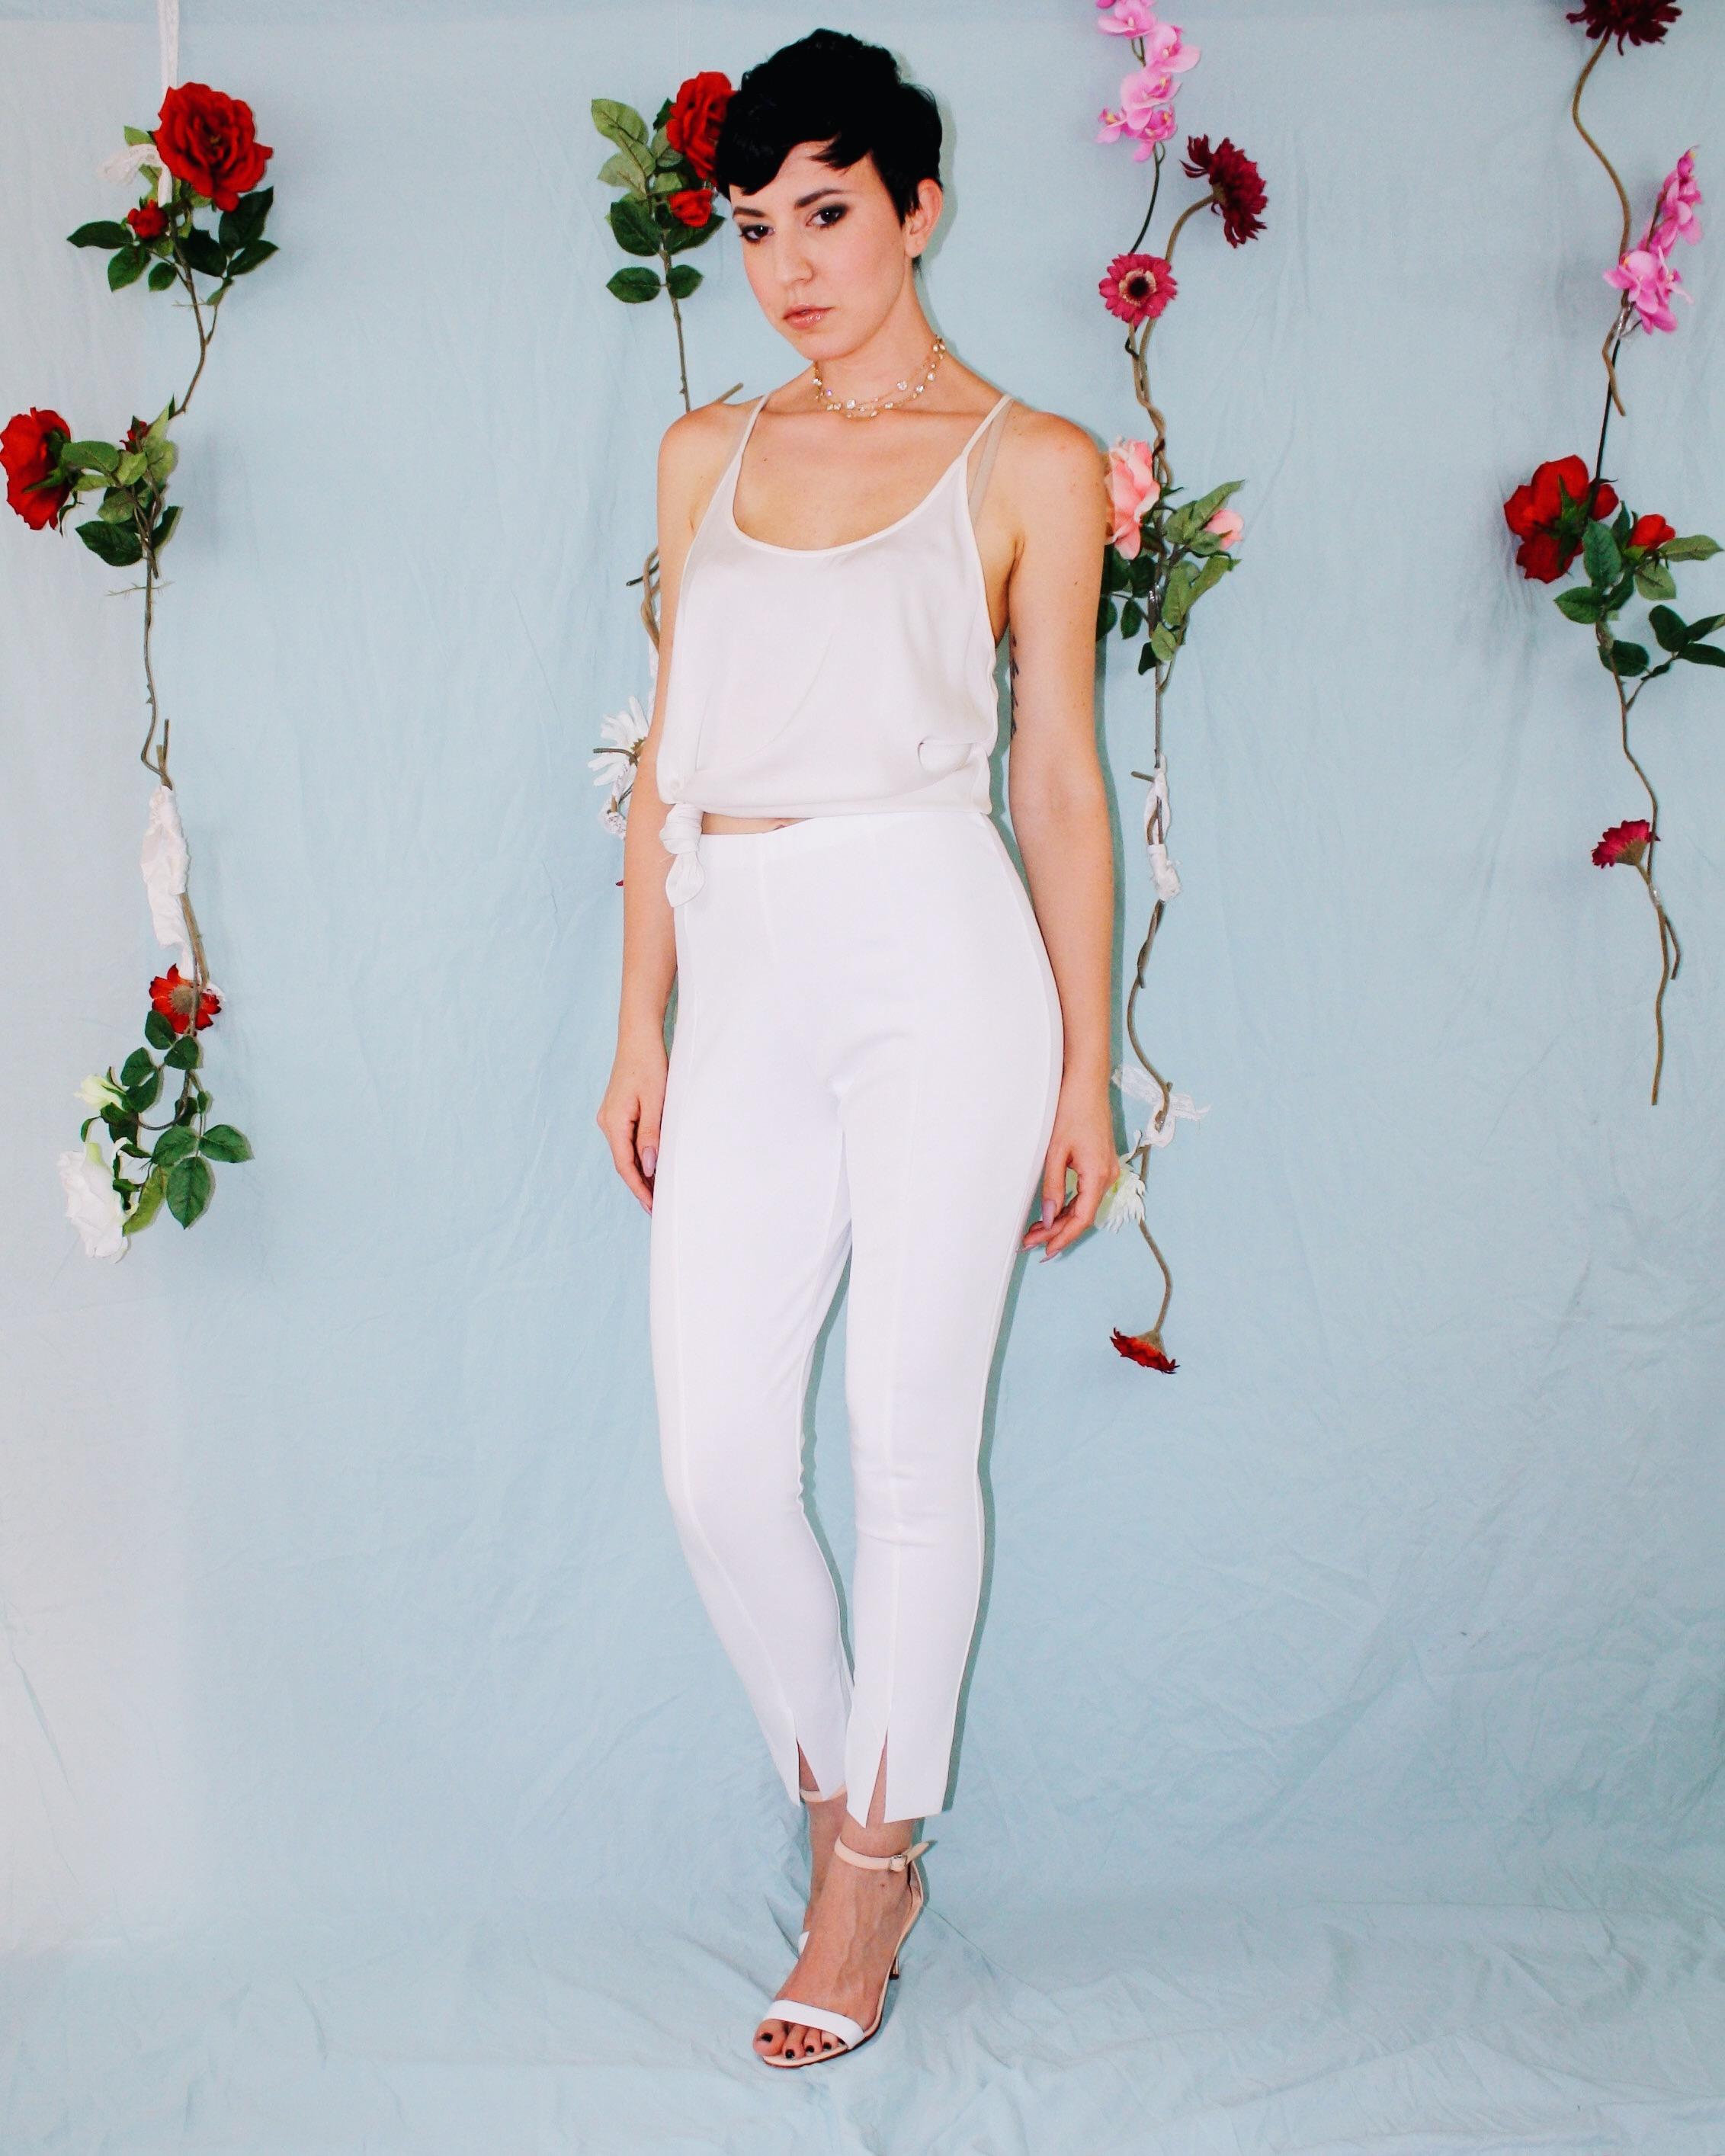 labor day outfit ideas white leggings silk tank lace boustier linen shorts dress